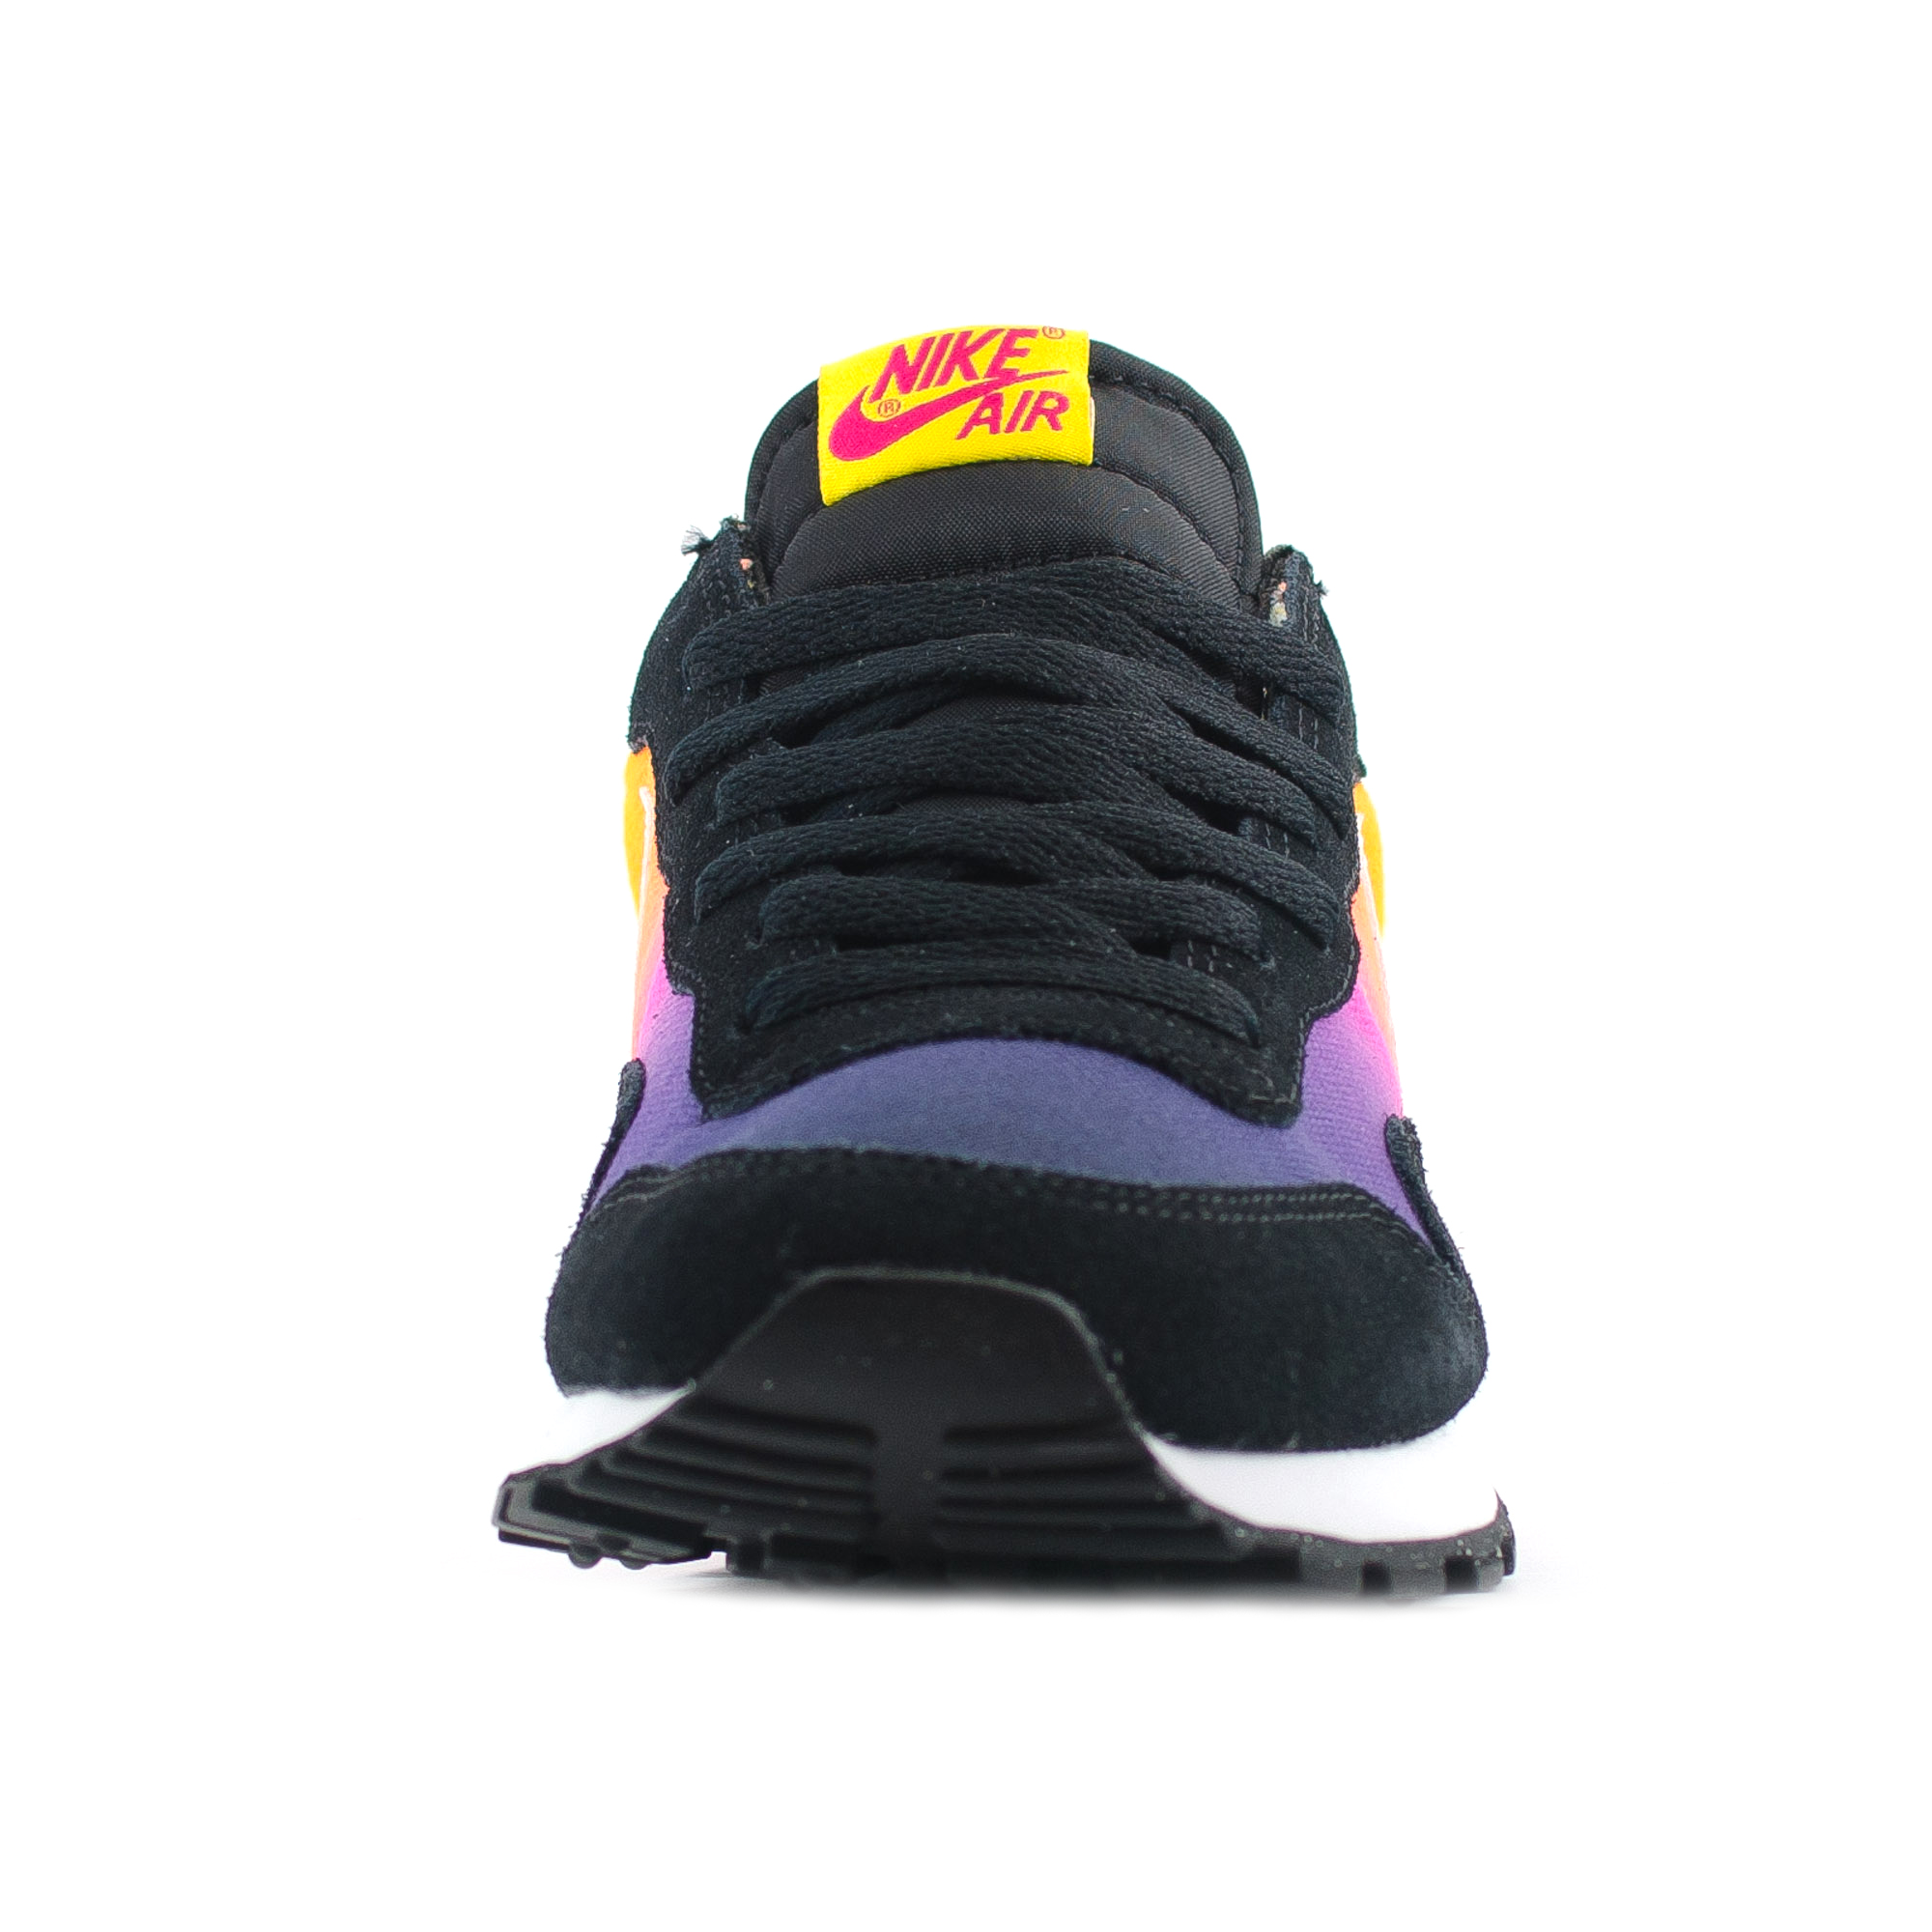 nike air pegasus size 14 Shop for men s clearance shoes ... 471cf183b